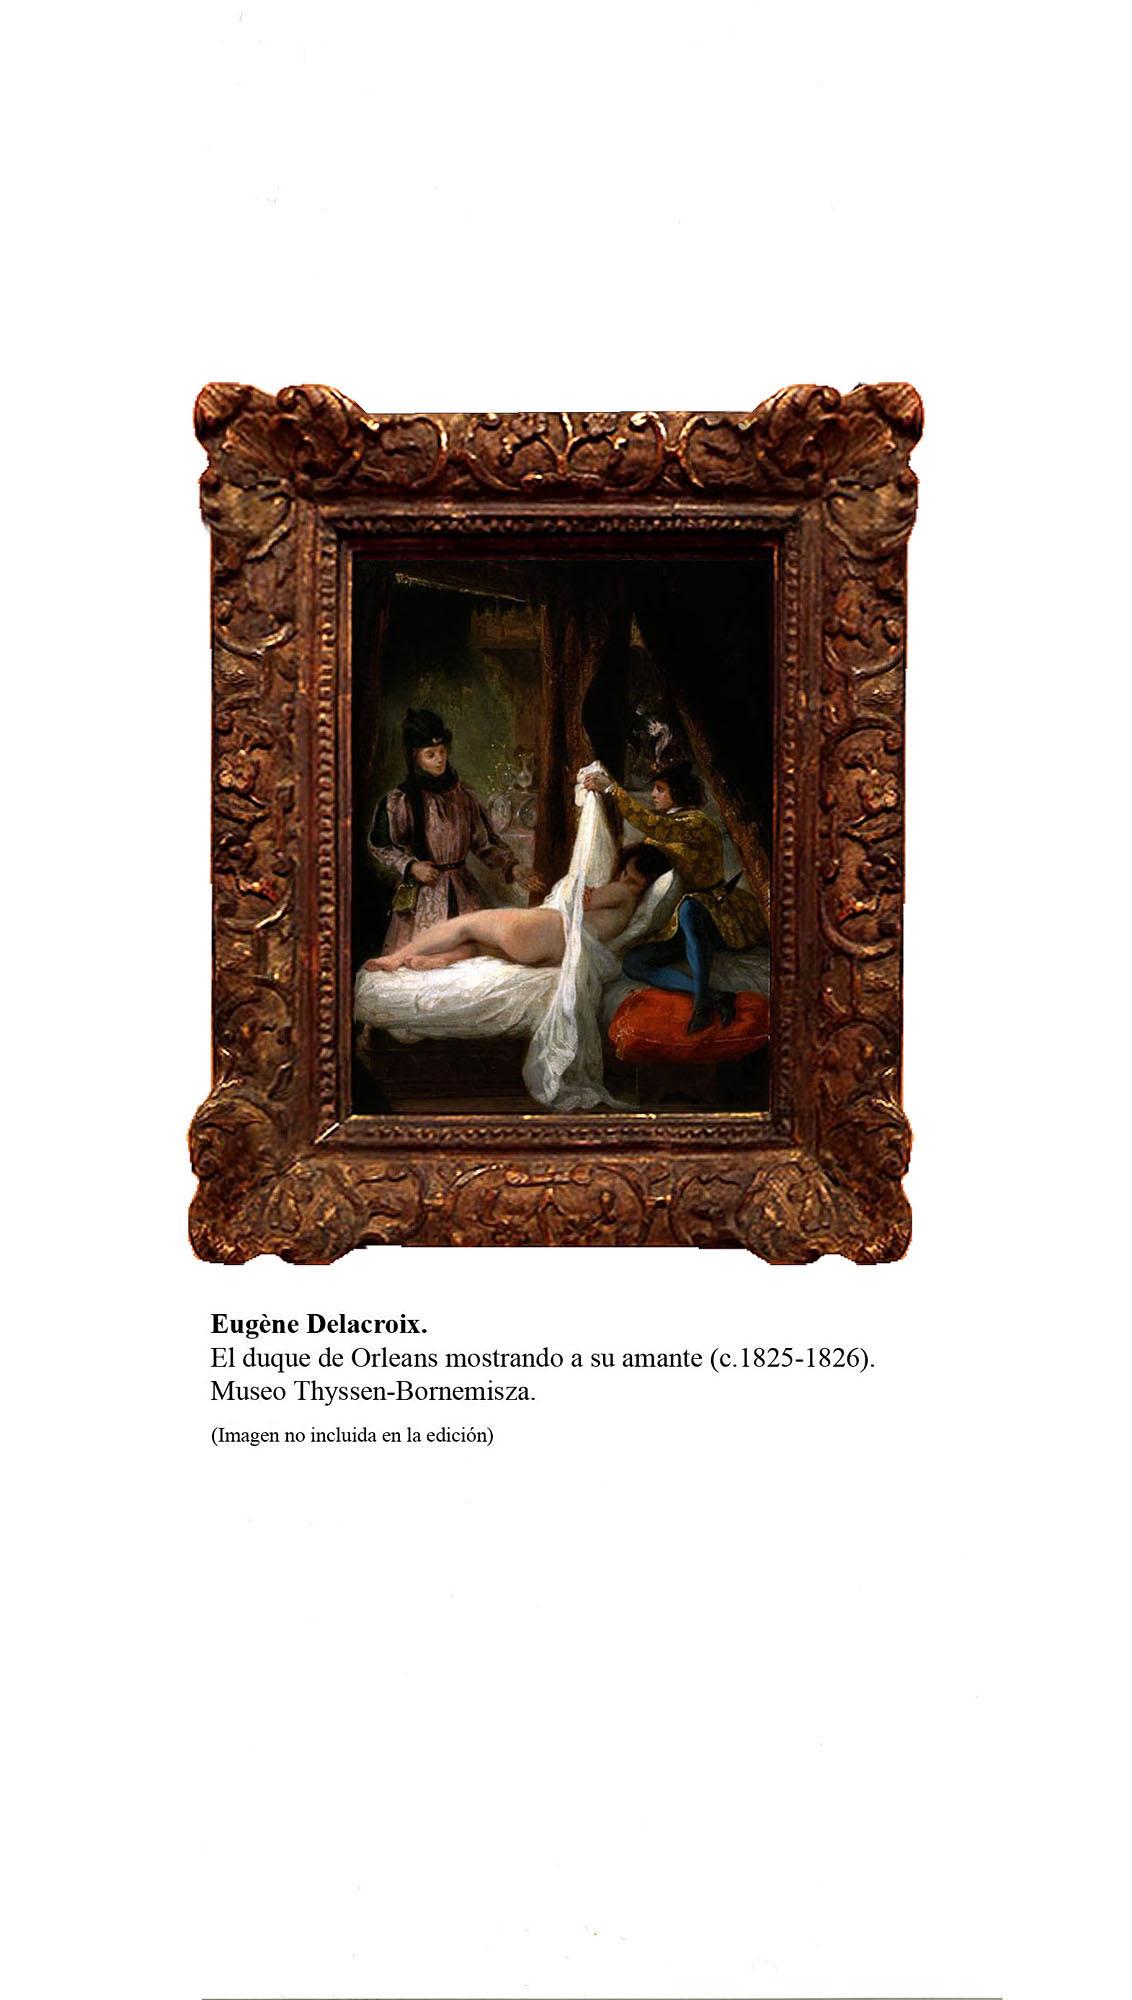 danielvillalobos-calderonsamaniego-story-storyerotic-spanishliterature-9